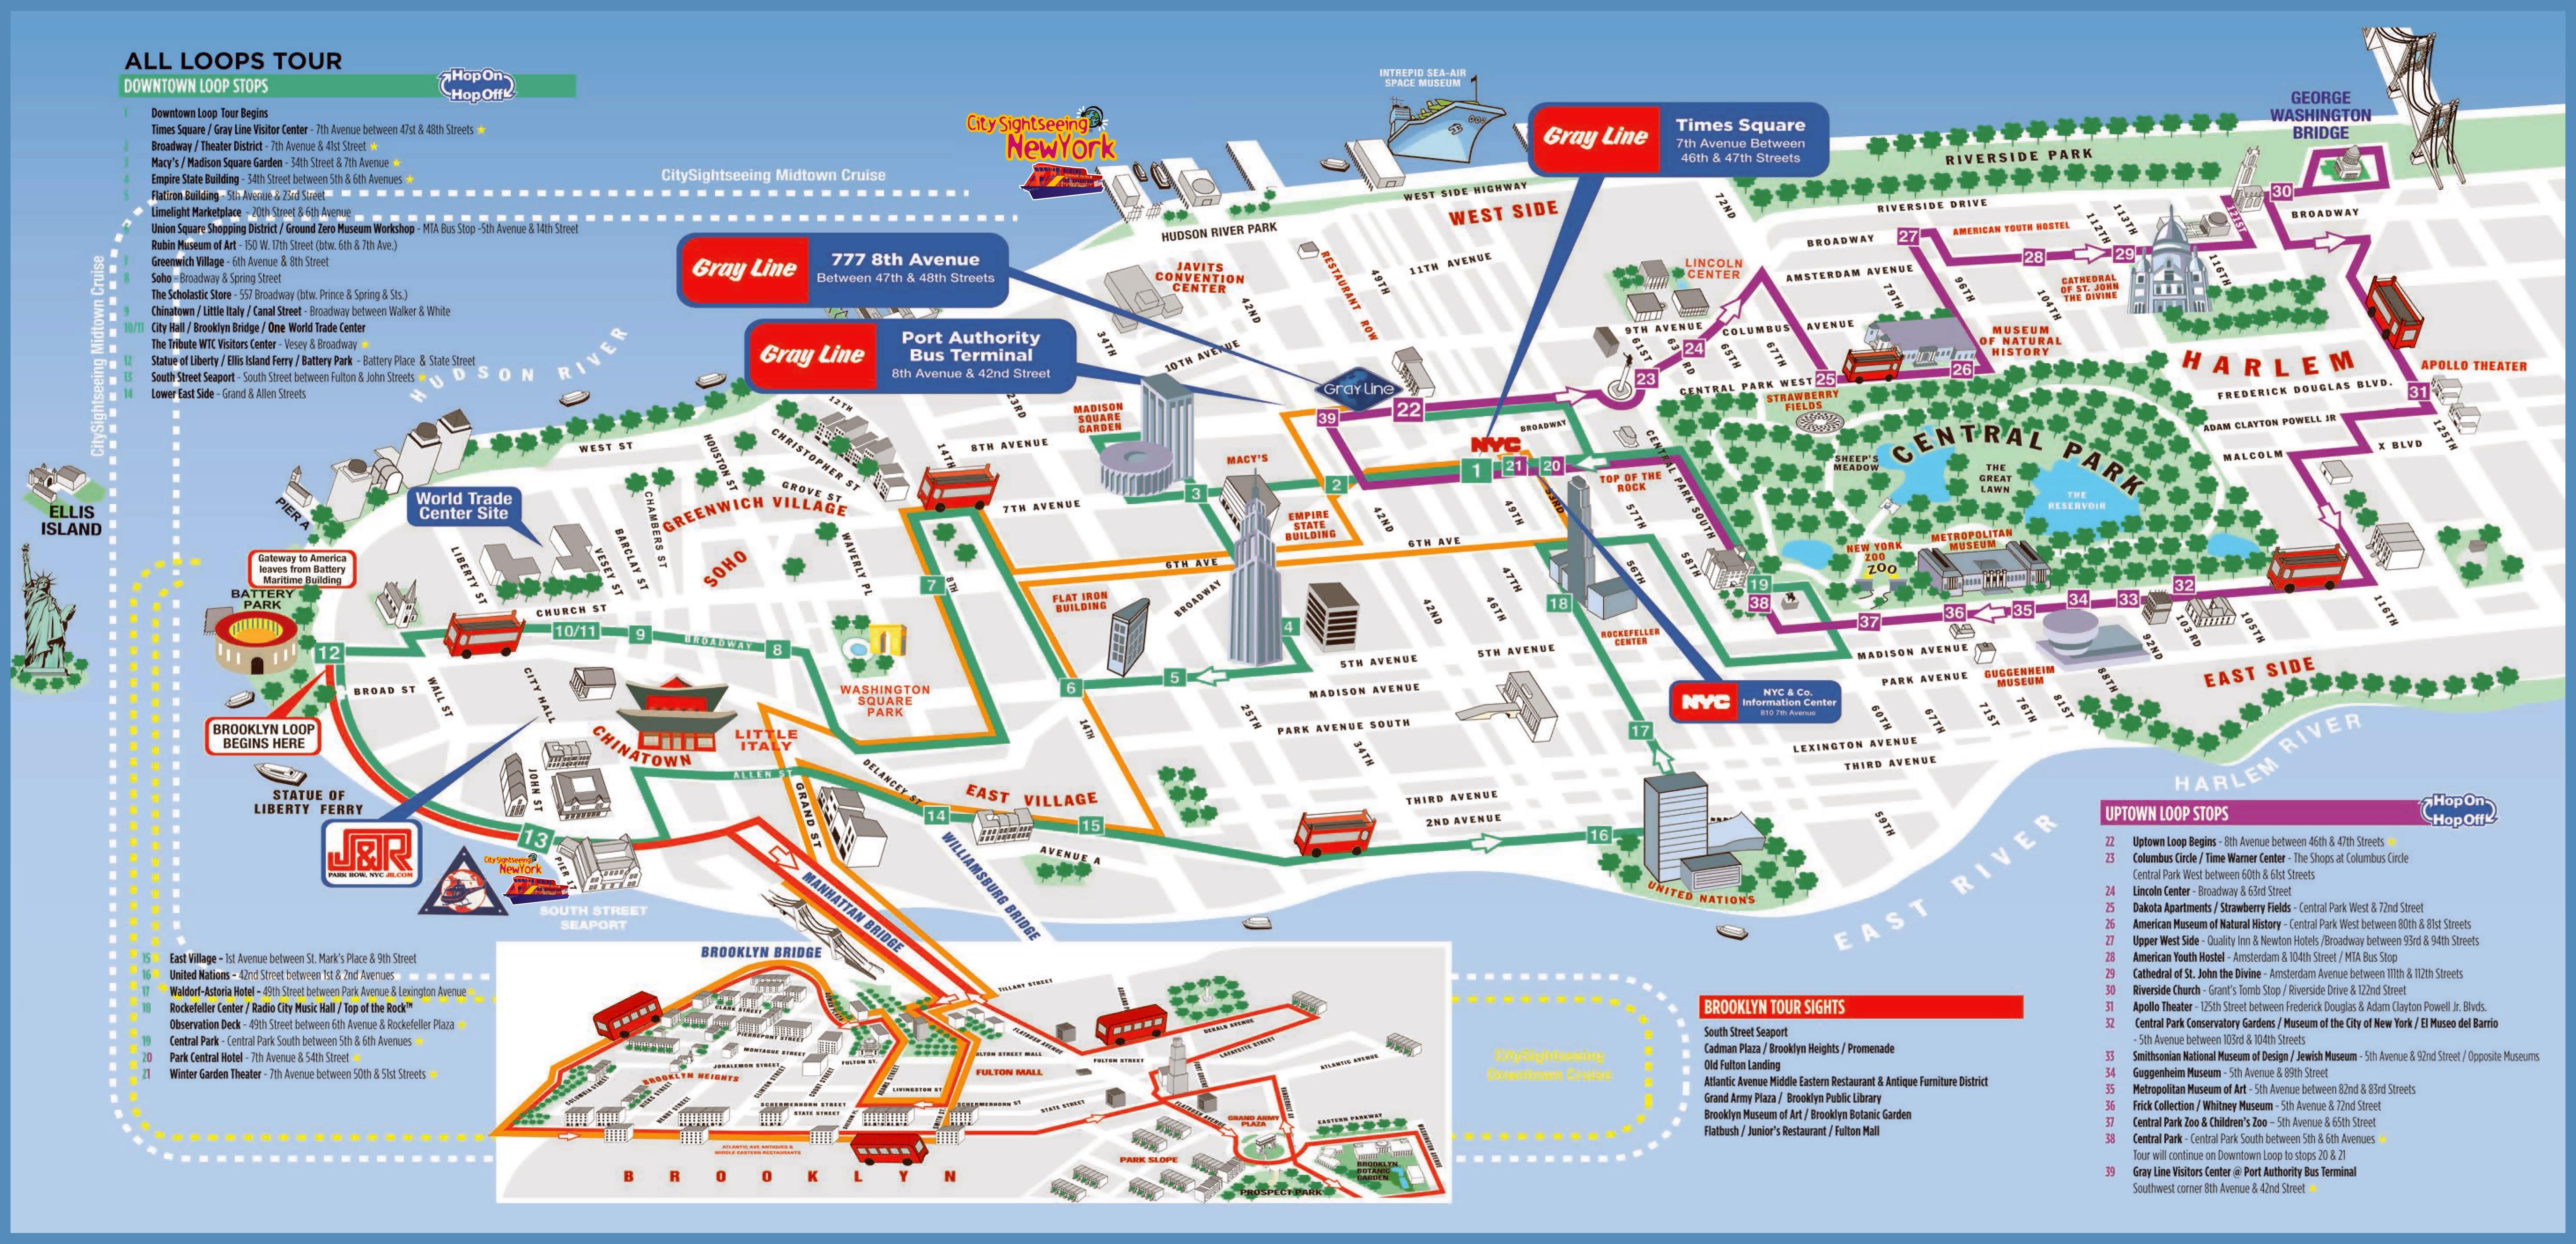 Large Printable Tourist Attractions Map Of Manhattan, New York City - Printable Street Map Of Manhattan